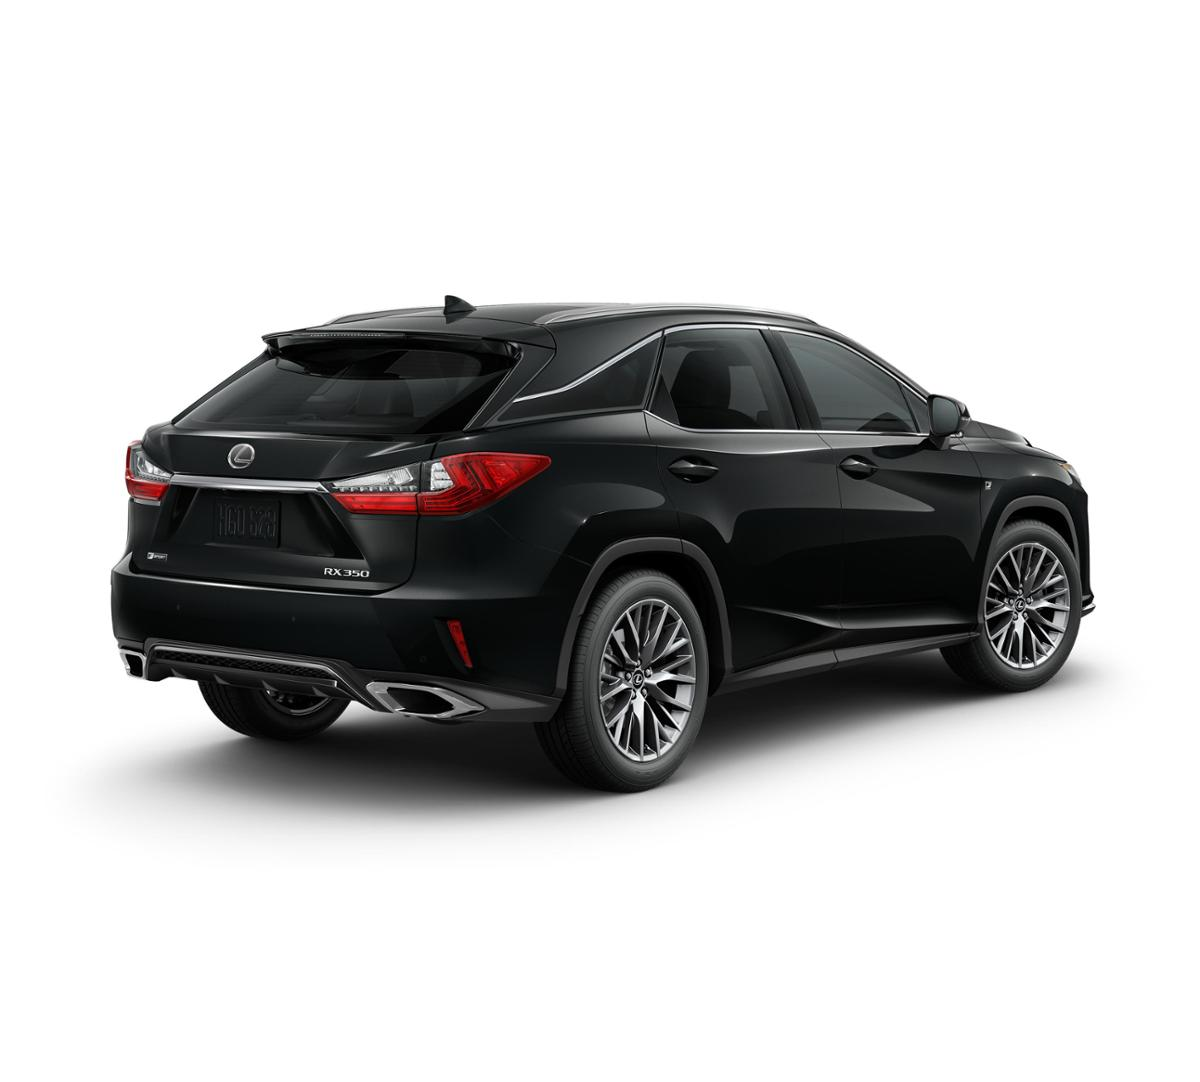 Lexus Dealerships In Ct: 2019 Lexus RX 350 For Sale - K165